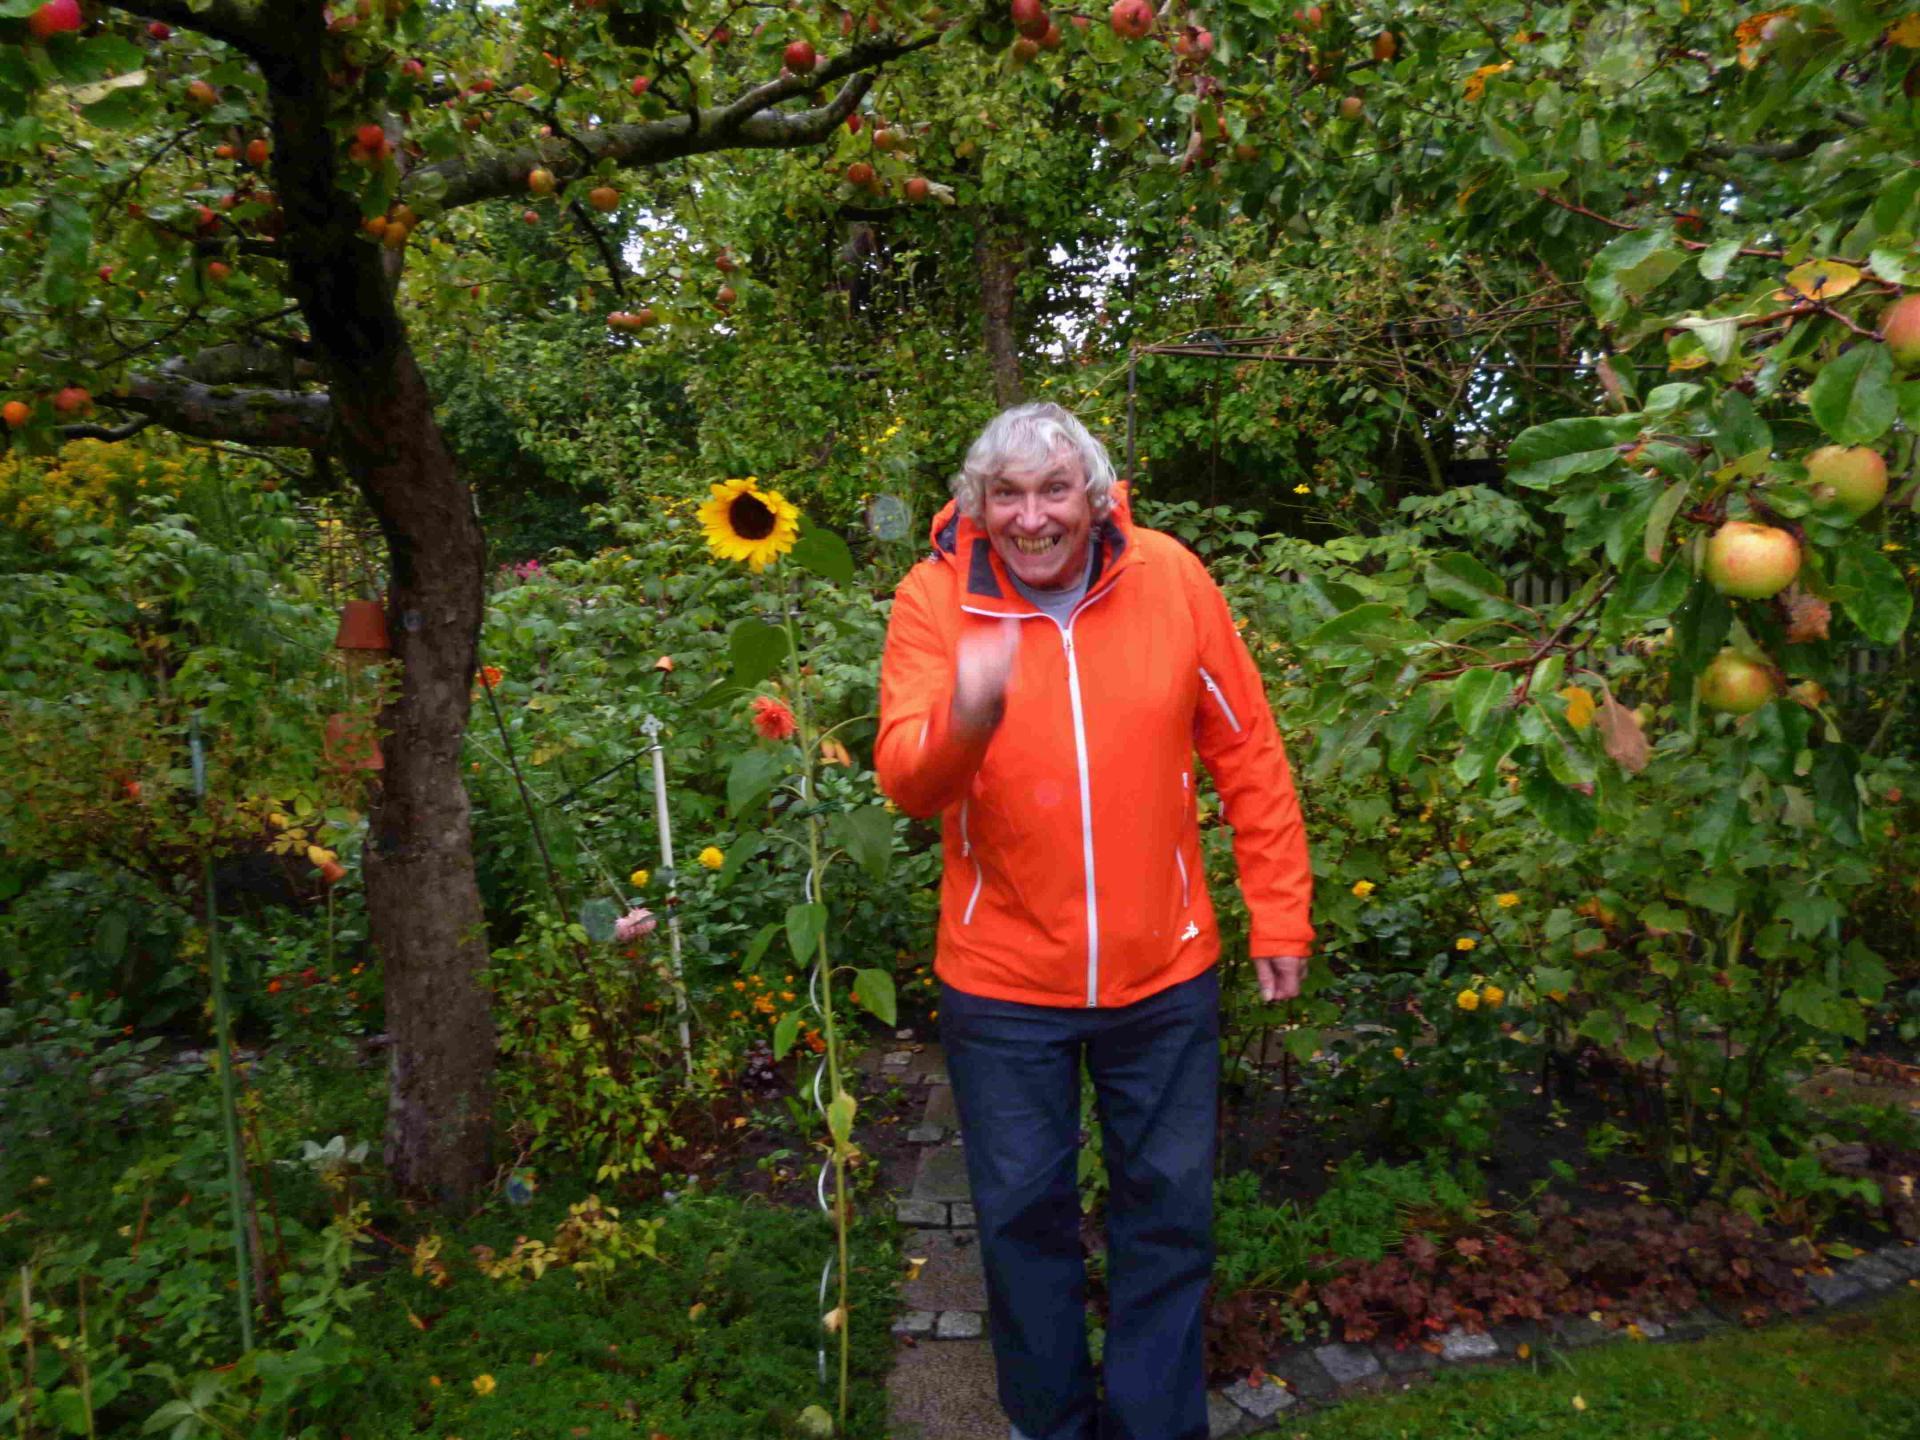 Offene Gartenpfporte 26-09-2020 Bild 10